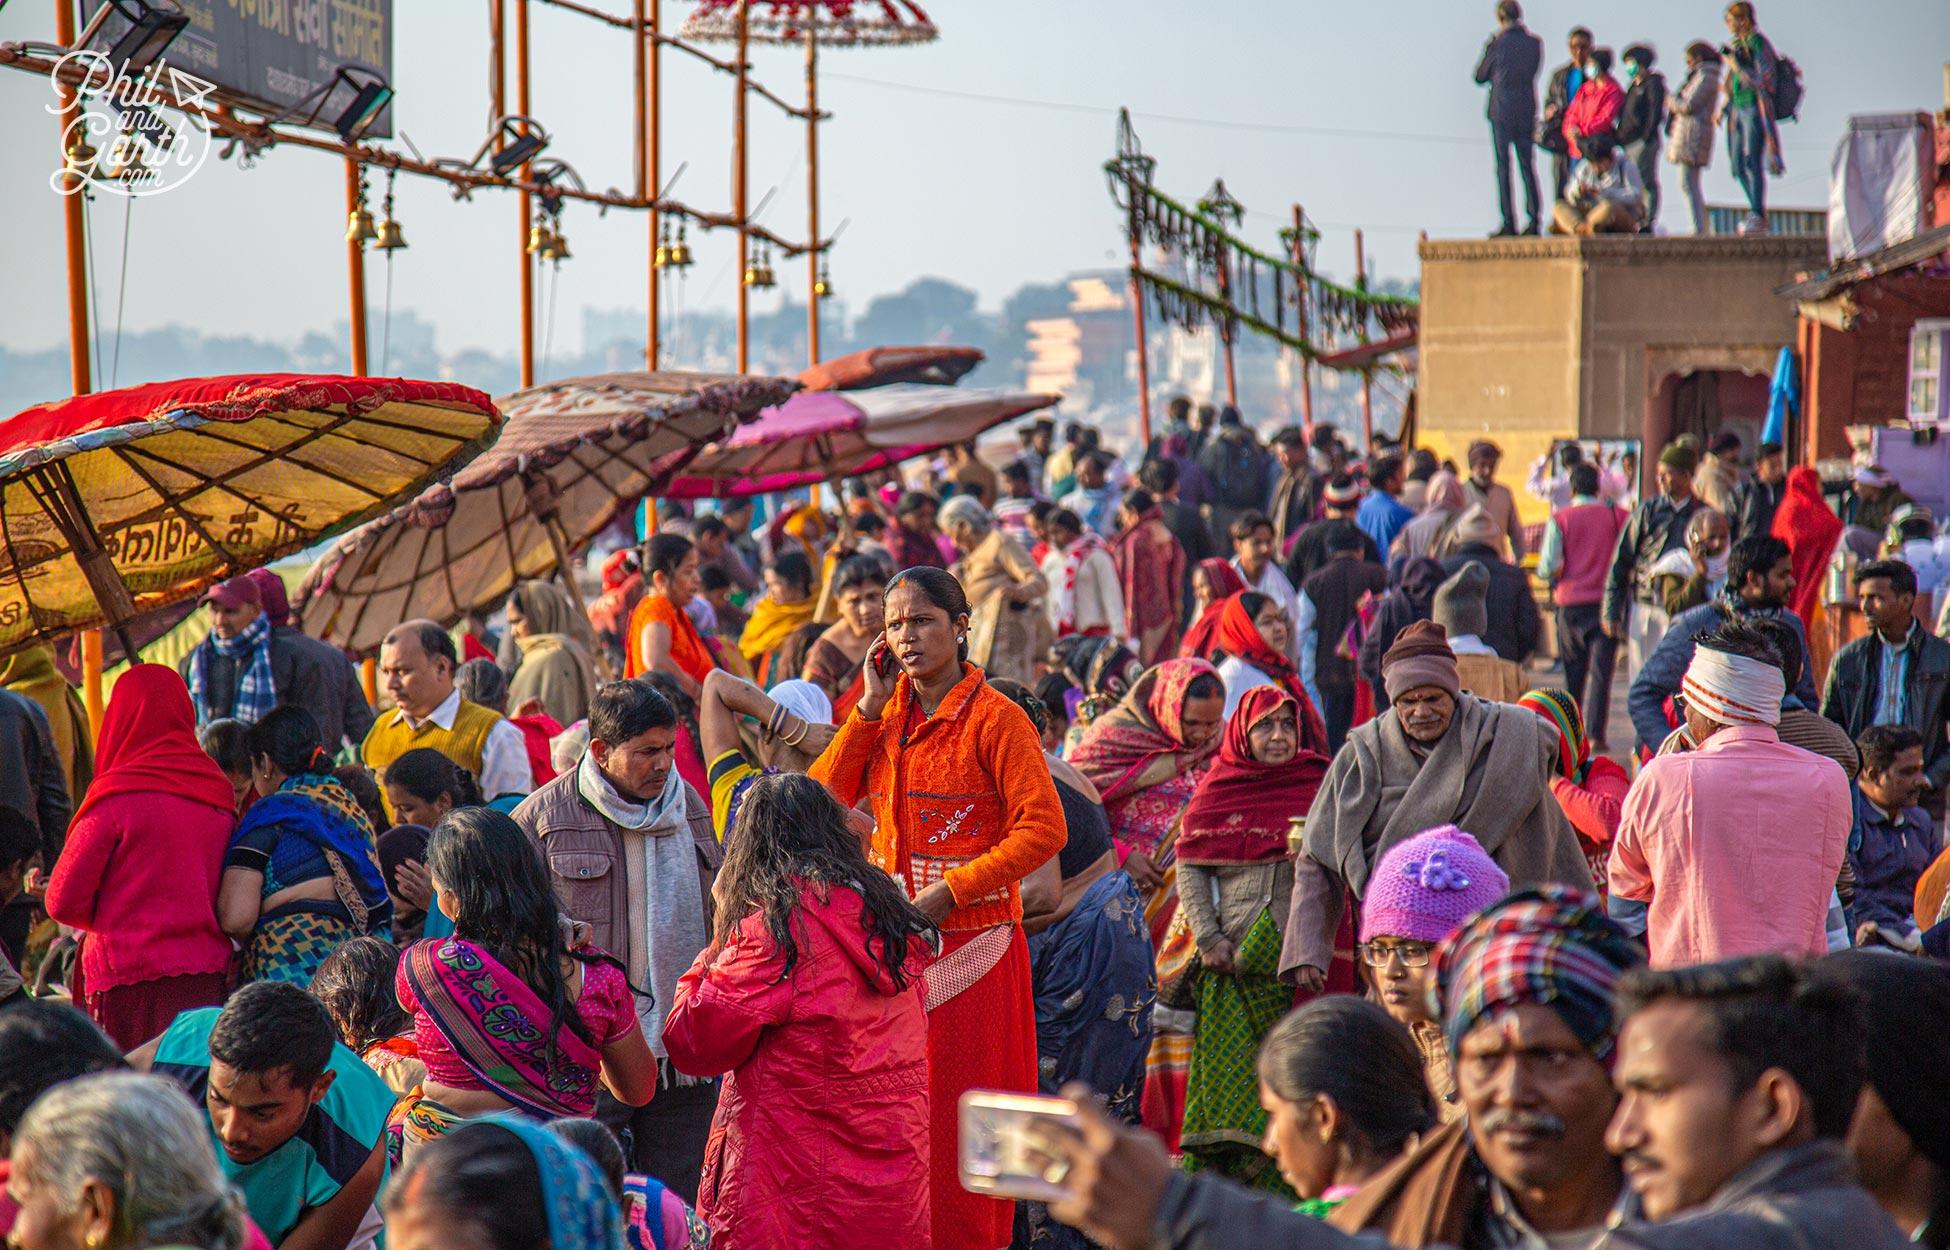 Crowds of people gathering at Dashashwamedh Ghat